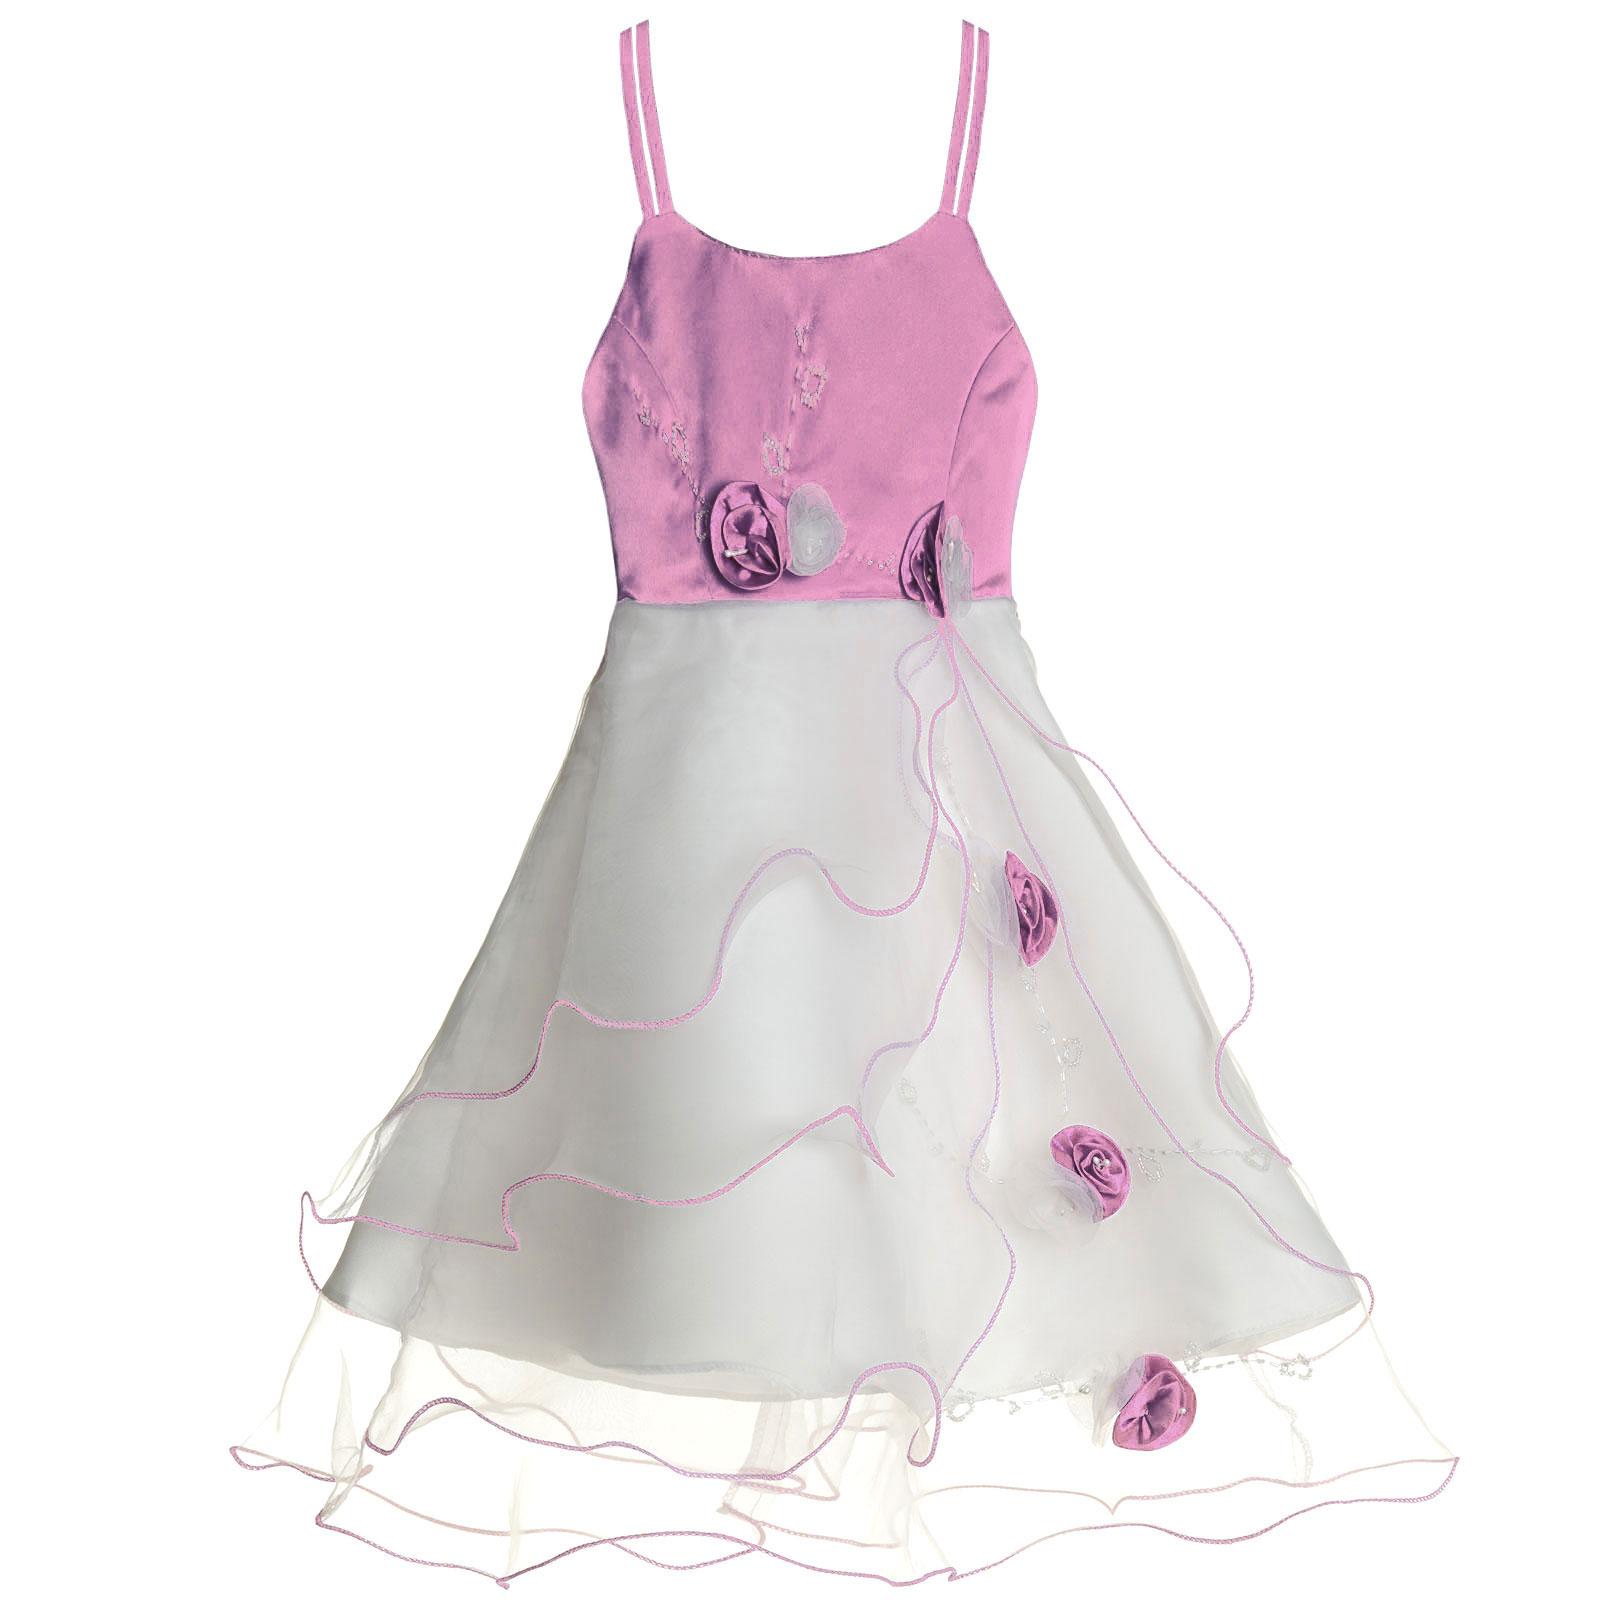 Maedchen-Kinder-Kleid-Peticoat-Festkleid-Lang-Arm-Kostuem-mit-Bolero-Rose-21476 Indexbild 16